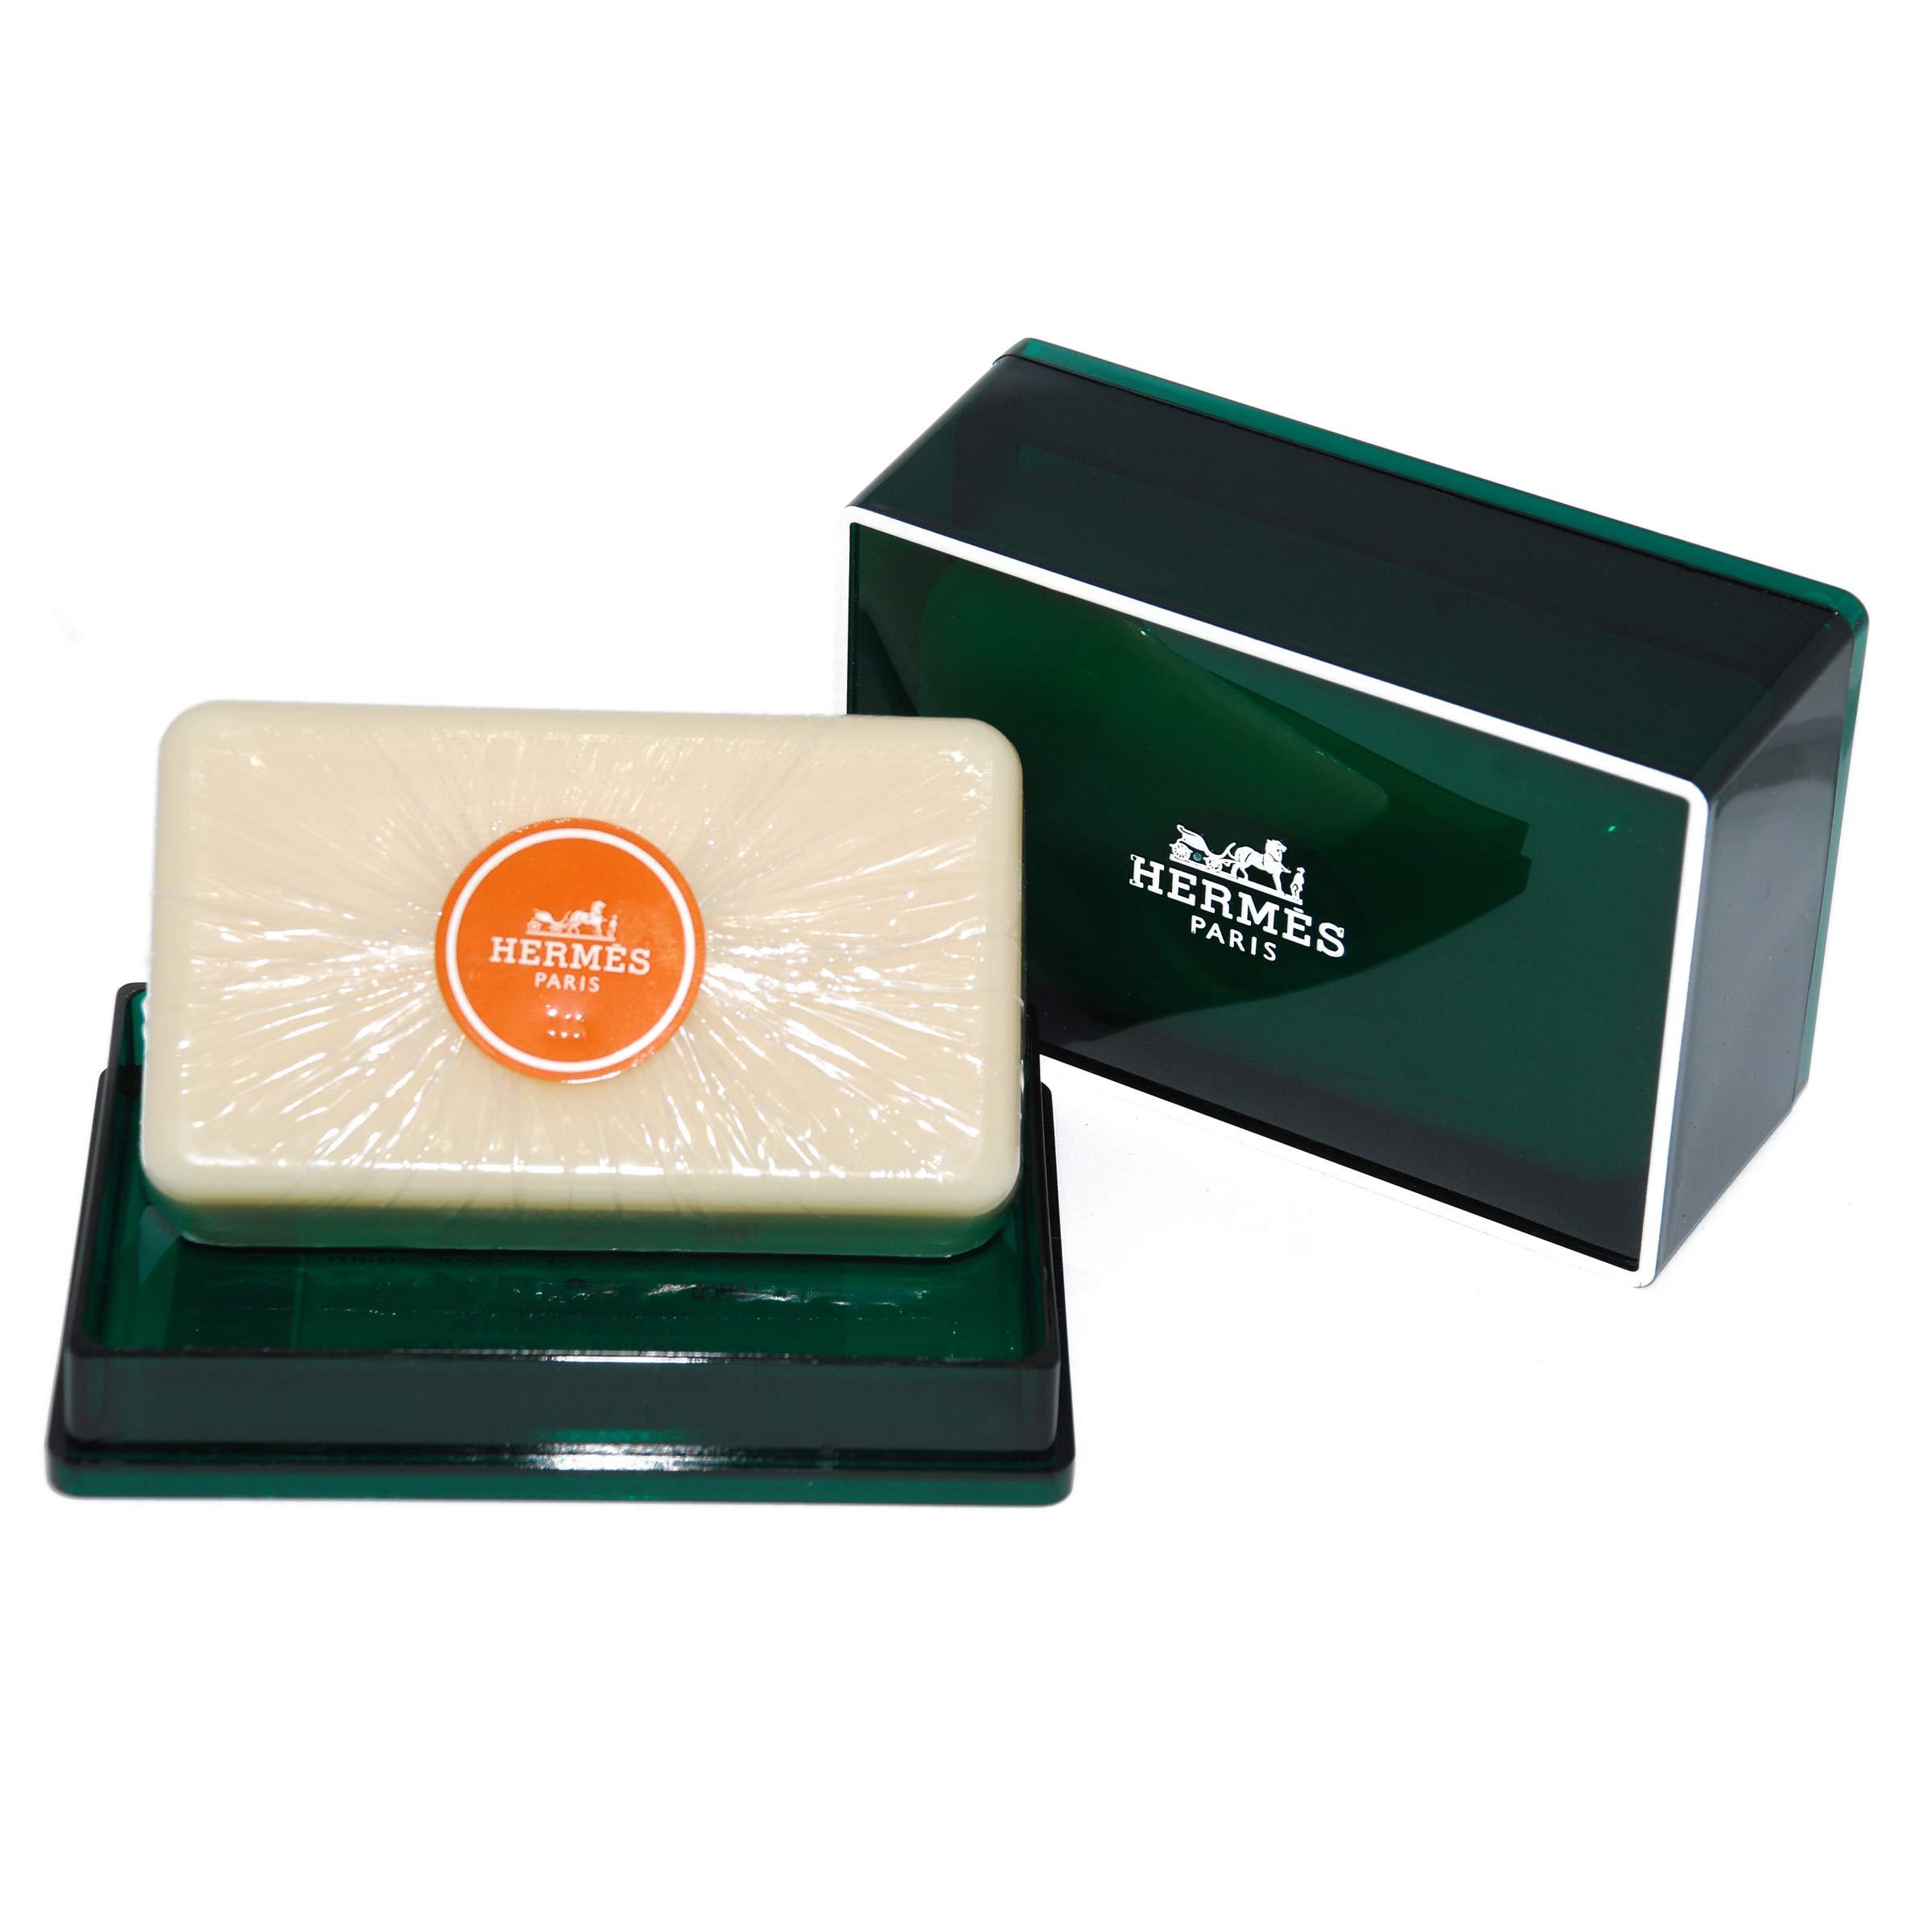 One (1) Luxury Hermès Jumbo Soap - Eau d'Orange Verte Gift Soap - Imported From Hermès Paris 5.2oz / 150g - Beautifully Gift Boxed Perfumed Soap/Savon Parfume